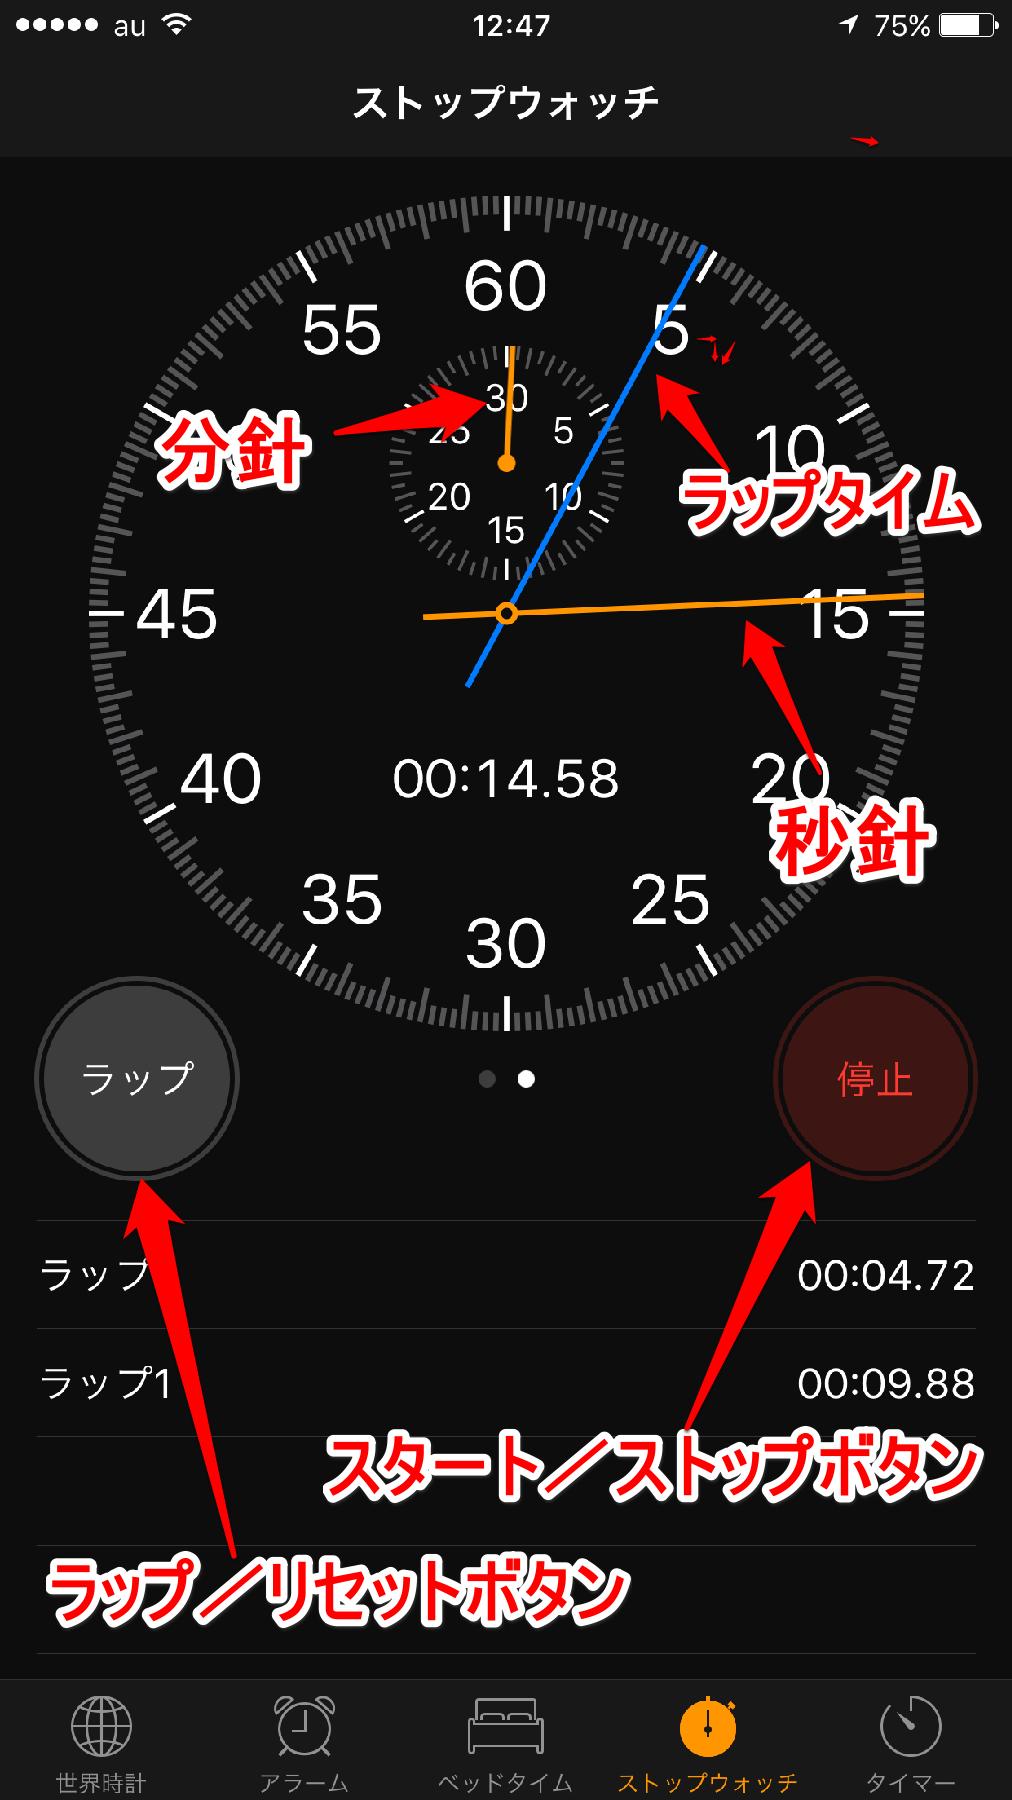 iPhoneの[時計]アプリのストップウォッチのアナログ表示画面その2